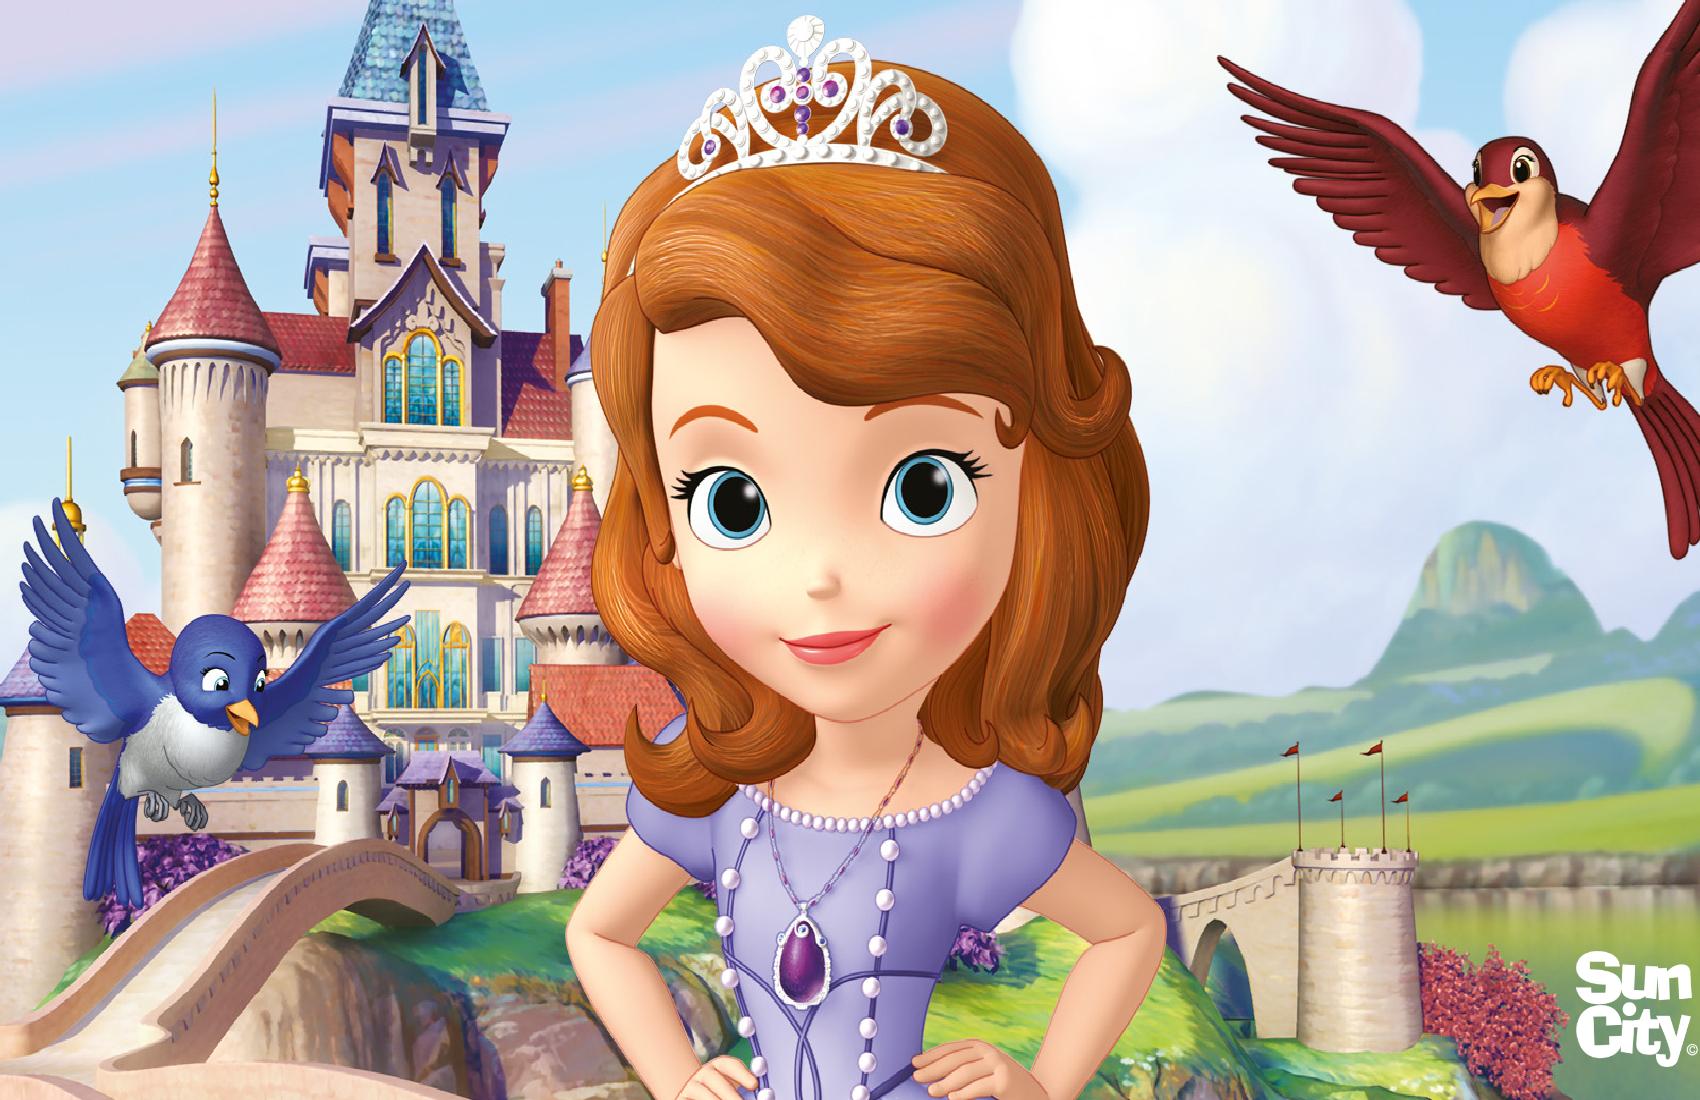 A Princesa Sofia Sun City Iberica